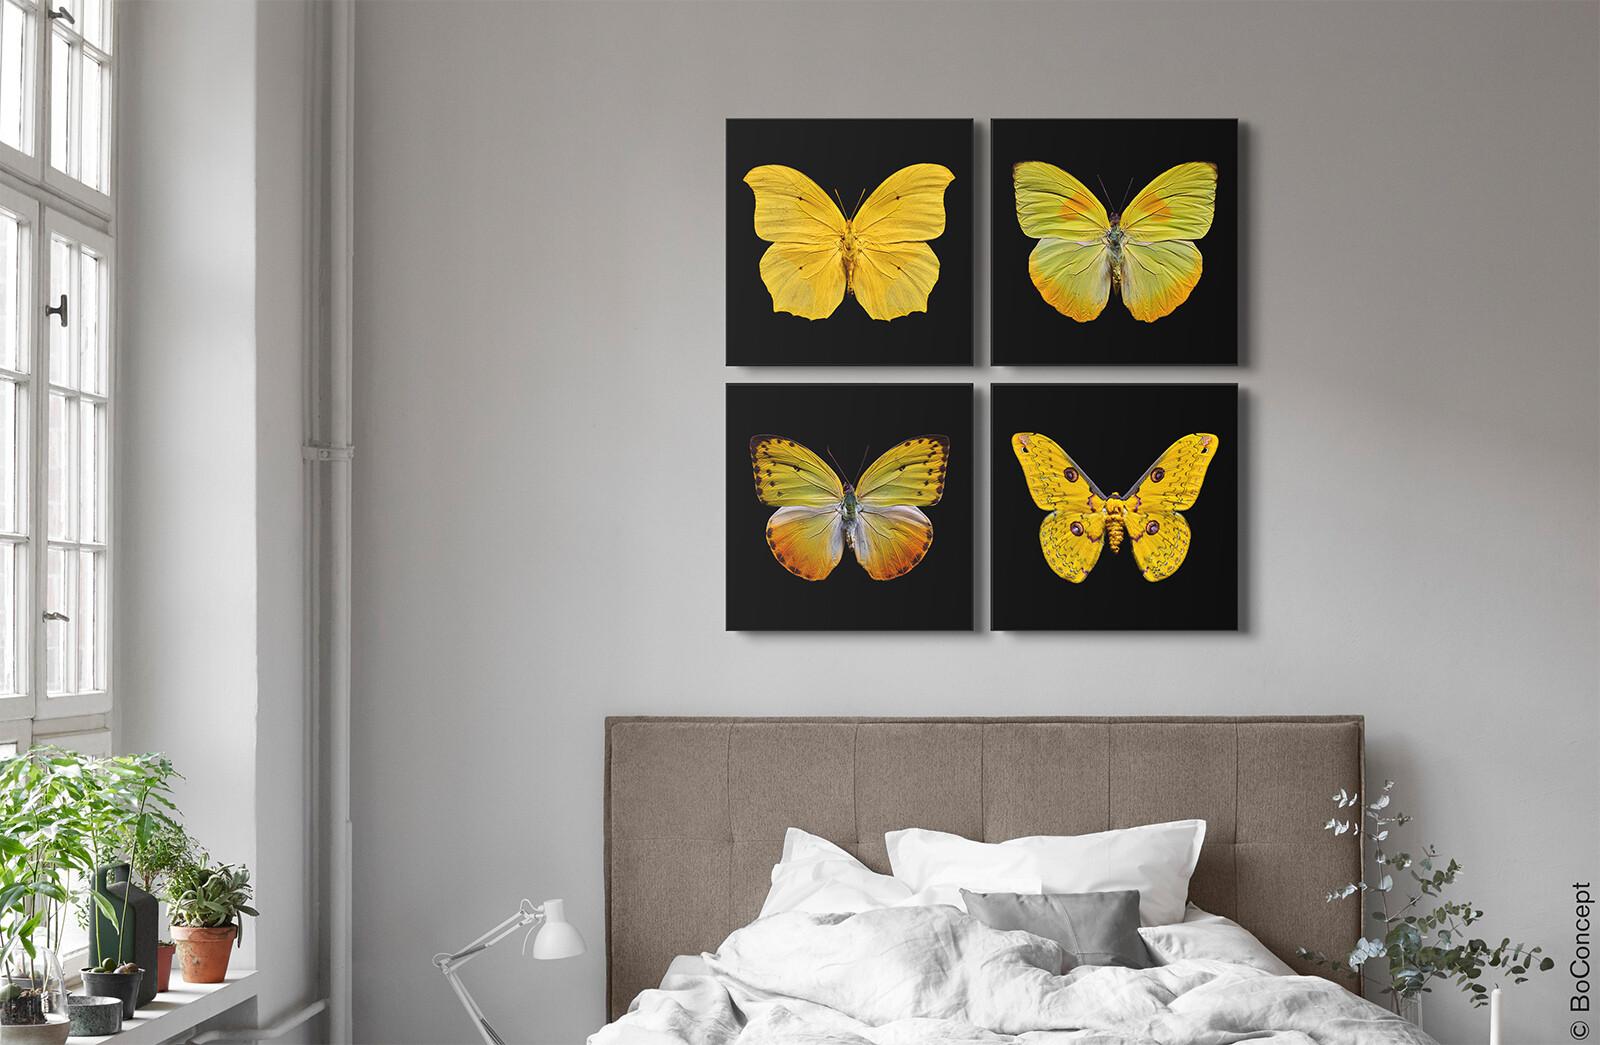 Butterfly Grid yellow - Heiko Hellwig